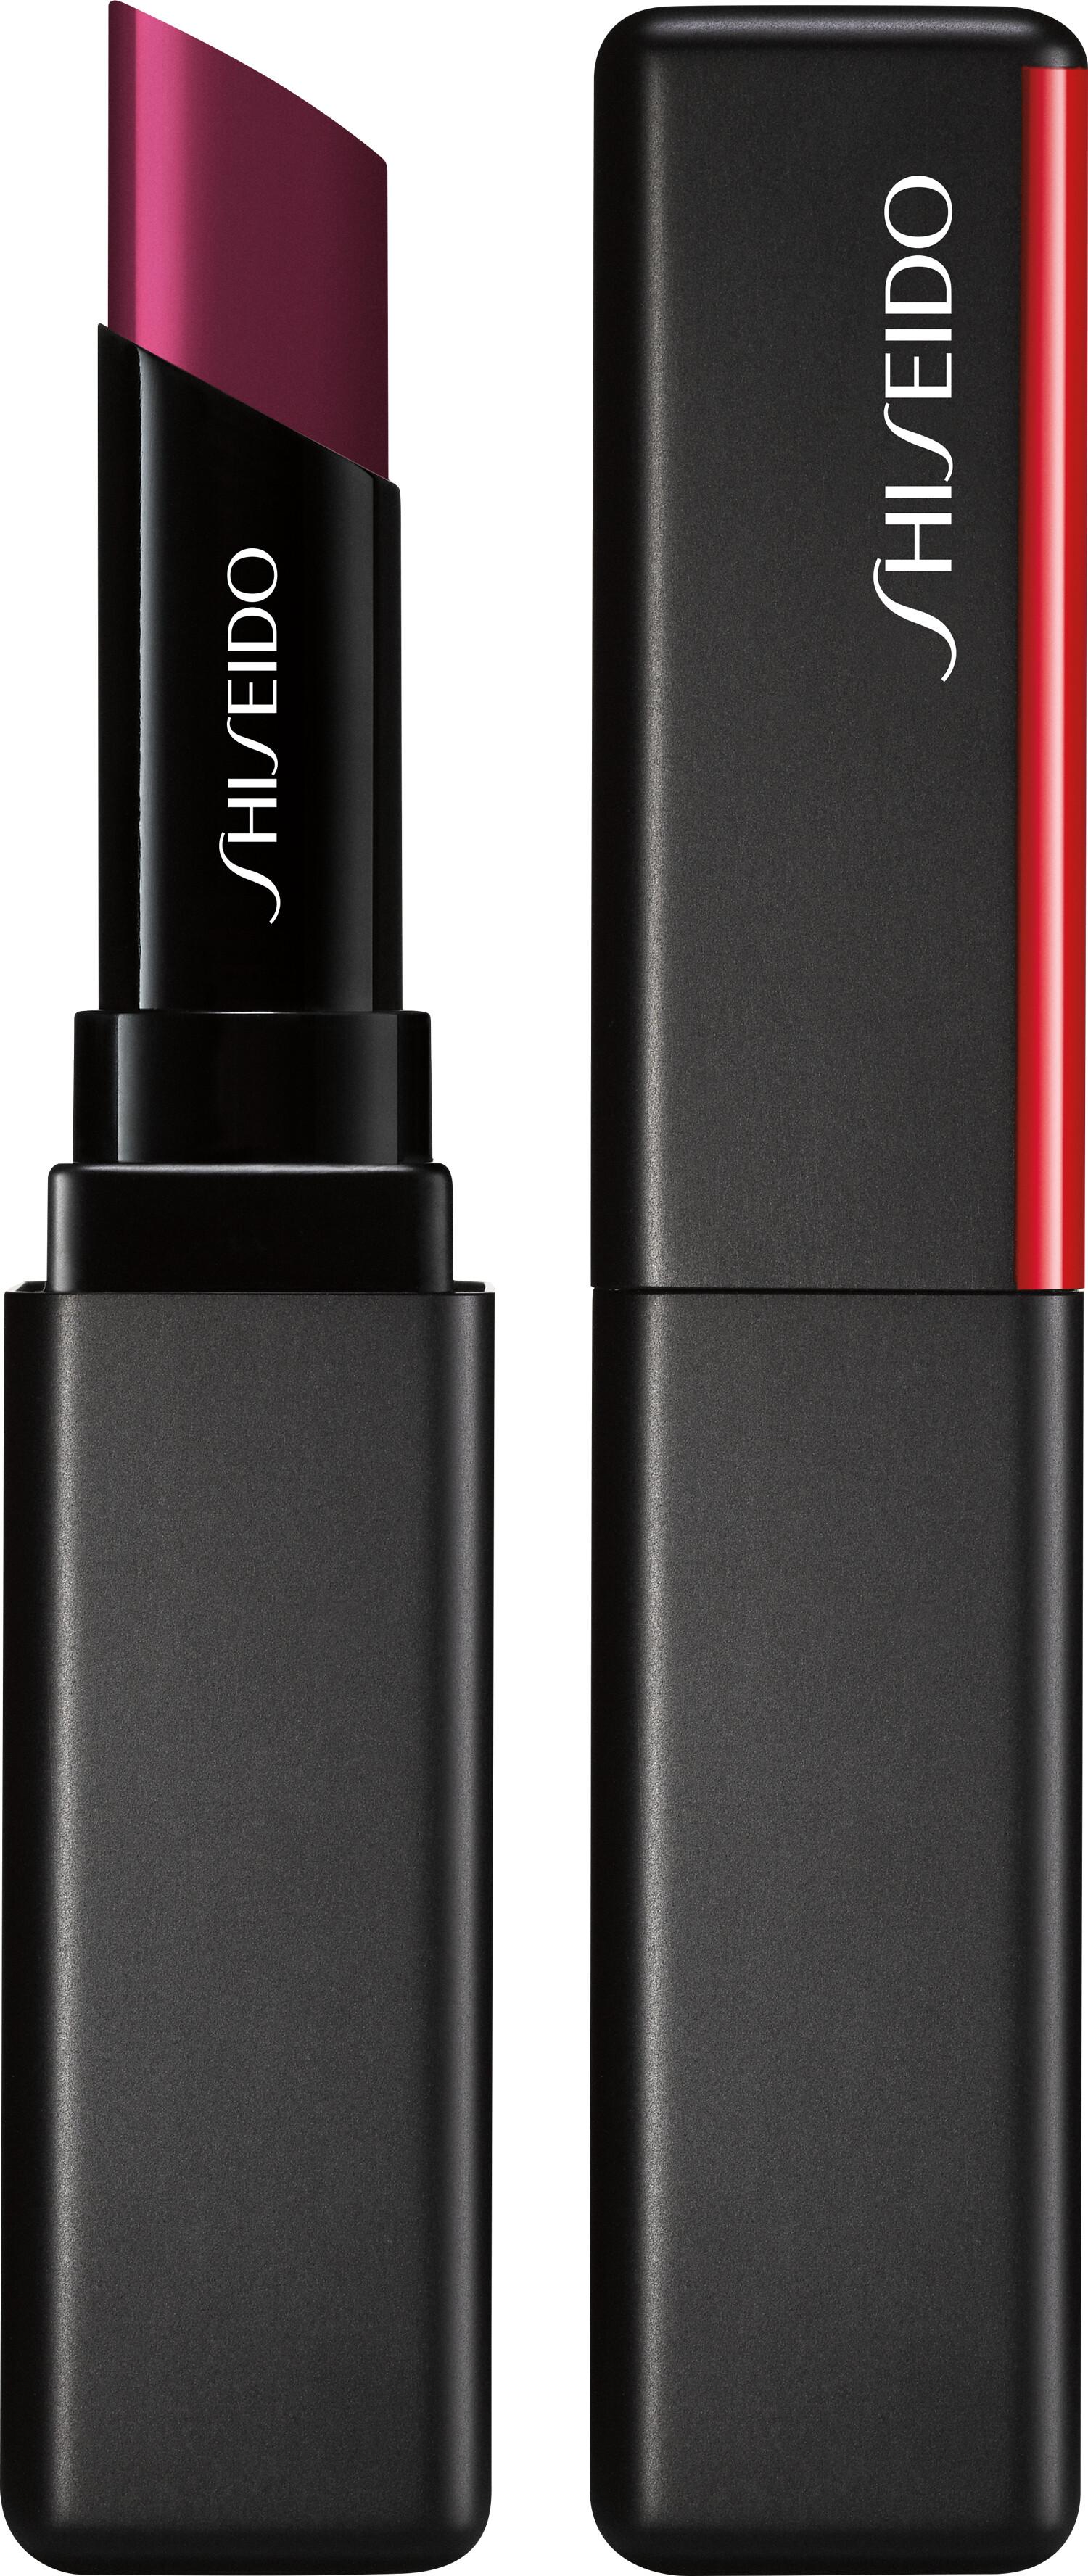 Shiseido VisionAiry Gel Lipstick 1.6g 216 - Vortex